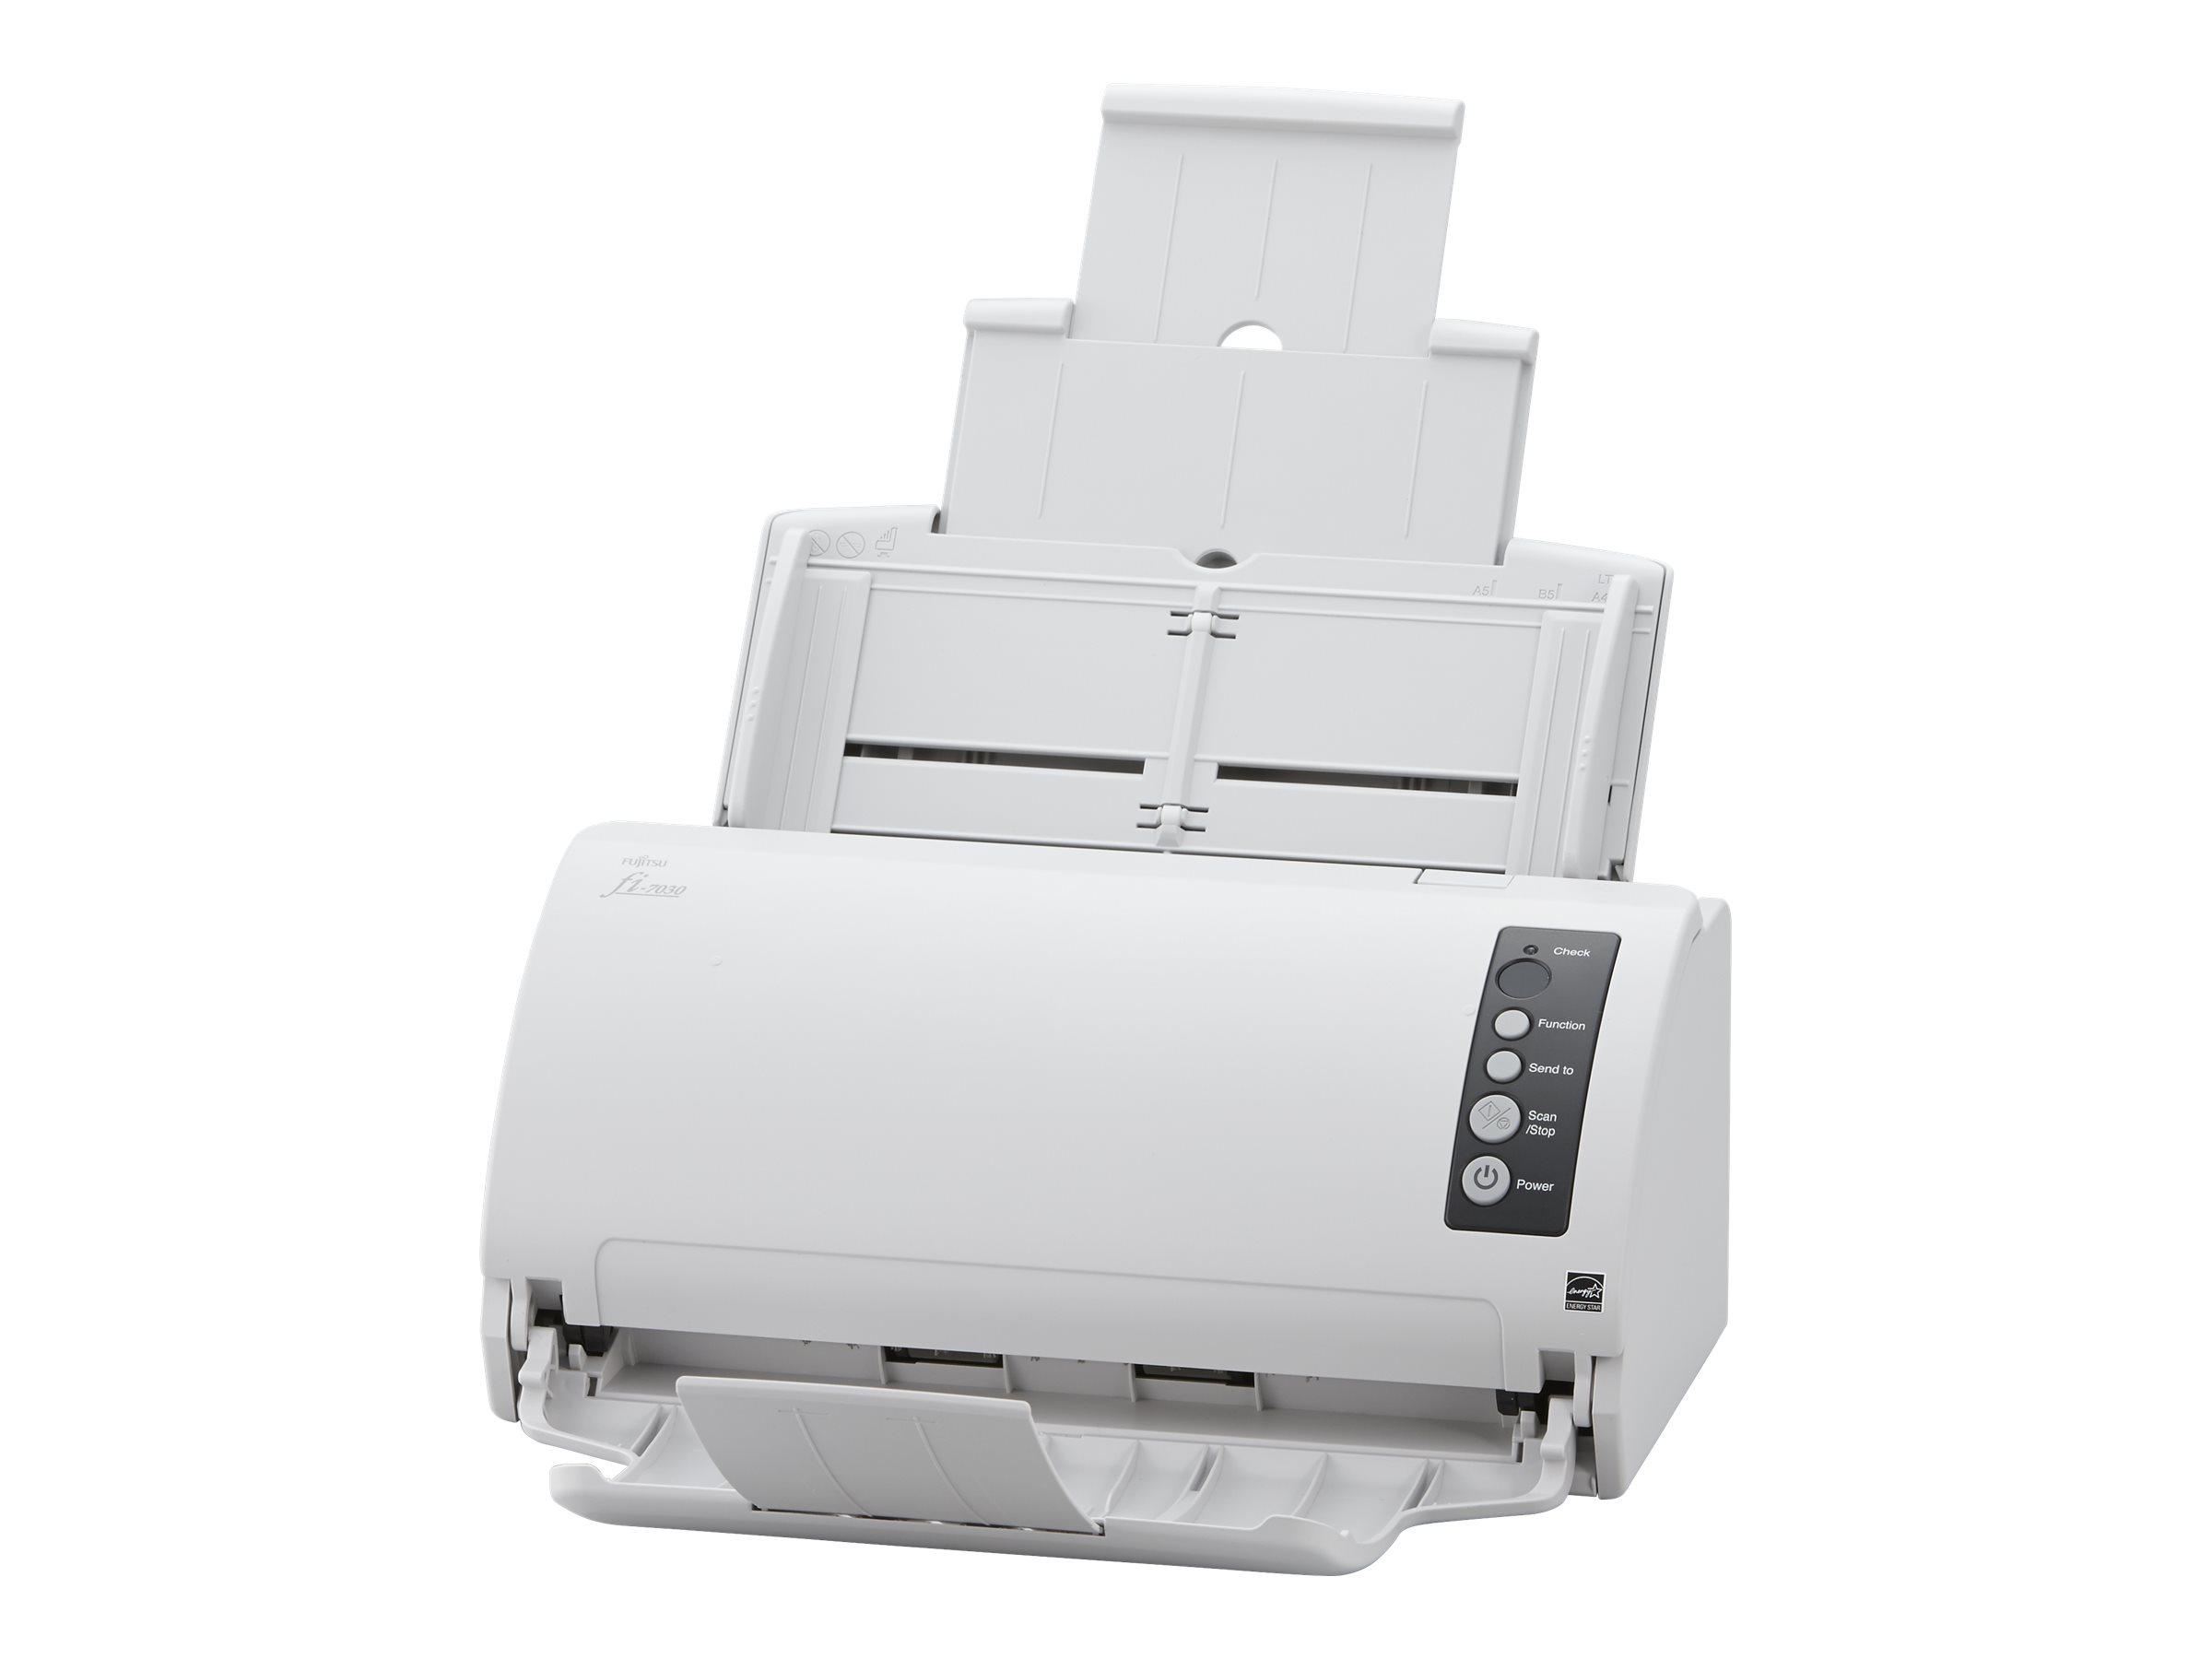 Fujitsu fi-7030 - Dokumentenscanner - Dual CCD - Duplex - 216 x 355.6 mm - 600 dpi x 600 dpi - bis zu 27 Seiten/Min. (einfarbig)